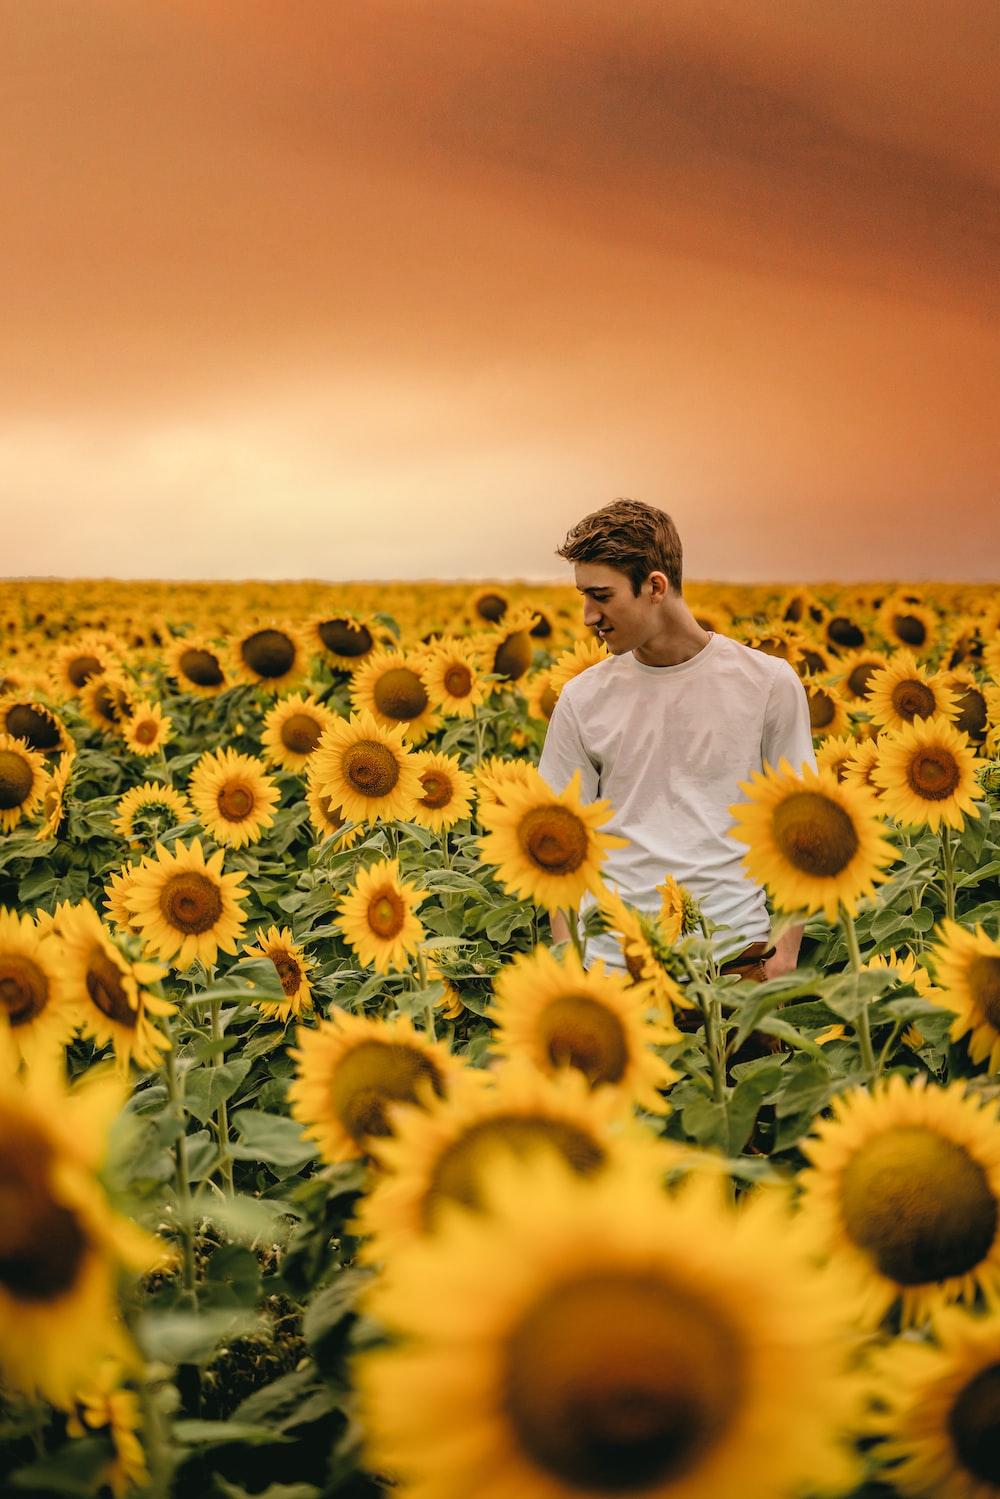 man in white dress shirt standing on sunflower field during daytime